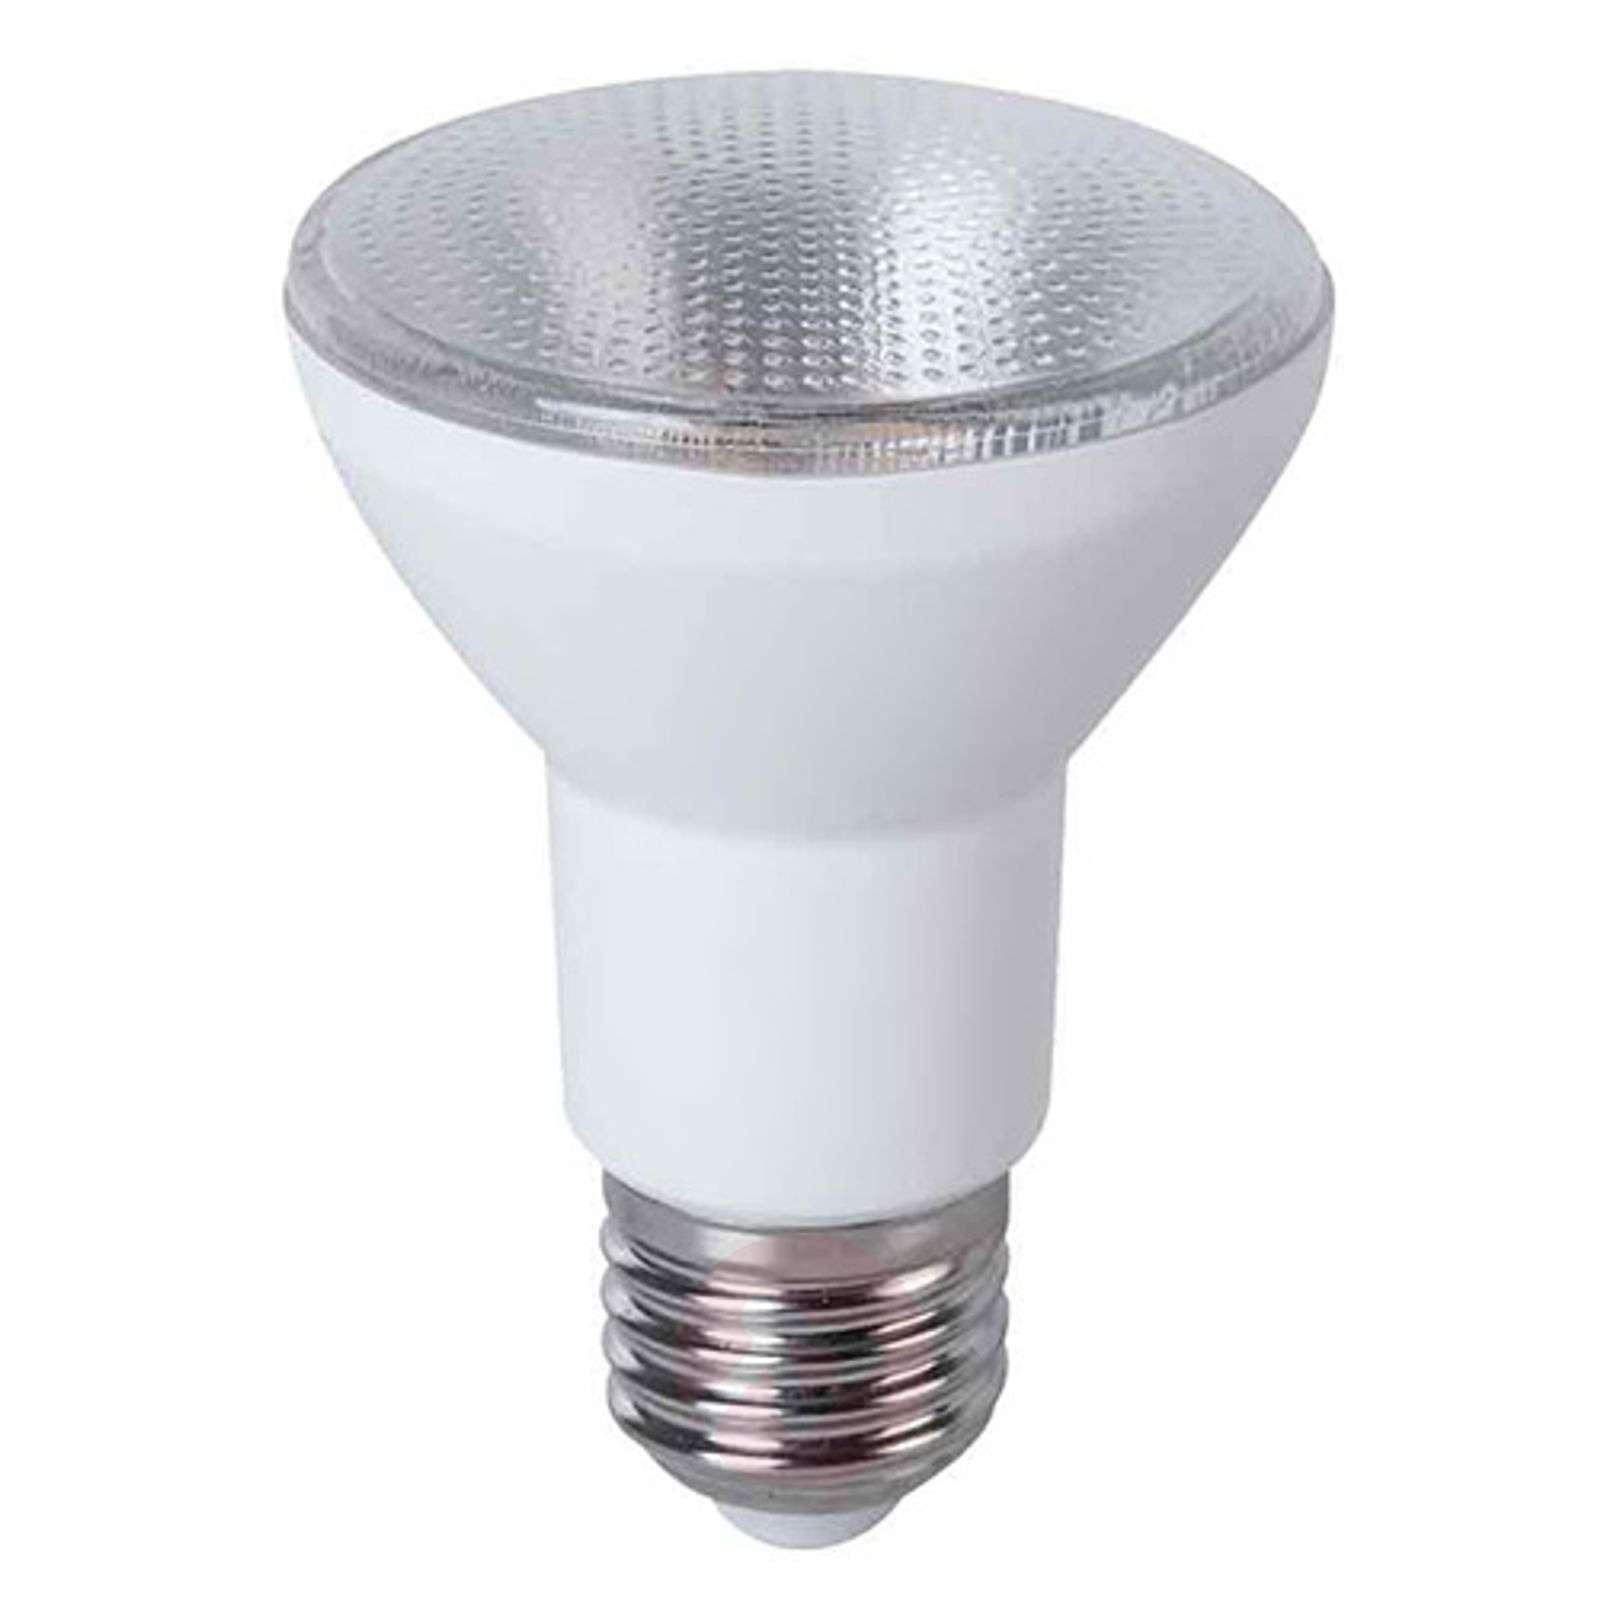 E27 6W 828 LED reflector PAR20 35degree by MEGAMAN-6530186-01